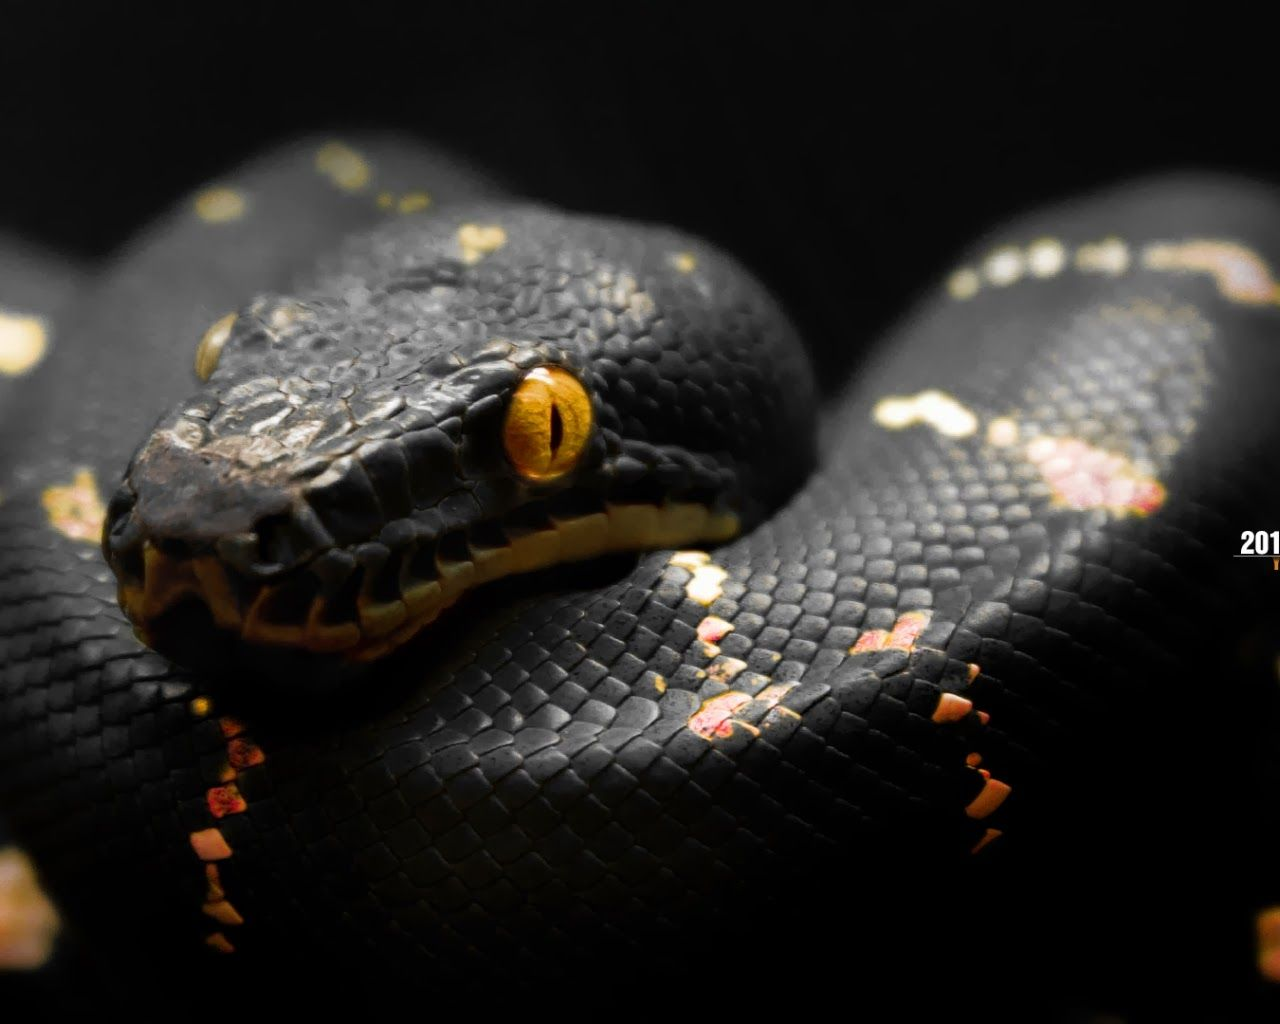 Cute Animal Wallpaper Download Free 4k Hd Wallpapers Background Imagescute Animal Wallpaper Black Mamba Snake Snake Wallpaper Mamba Snake